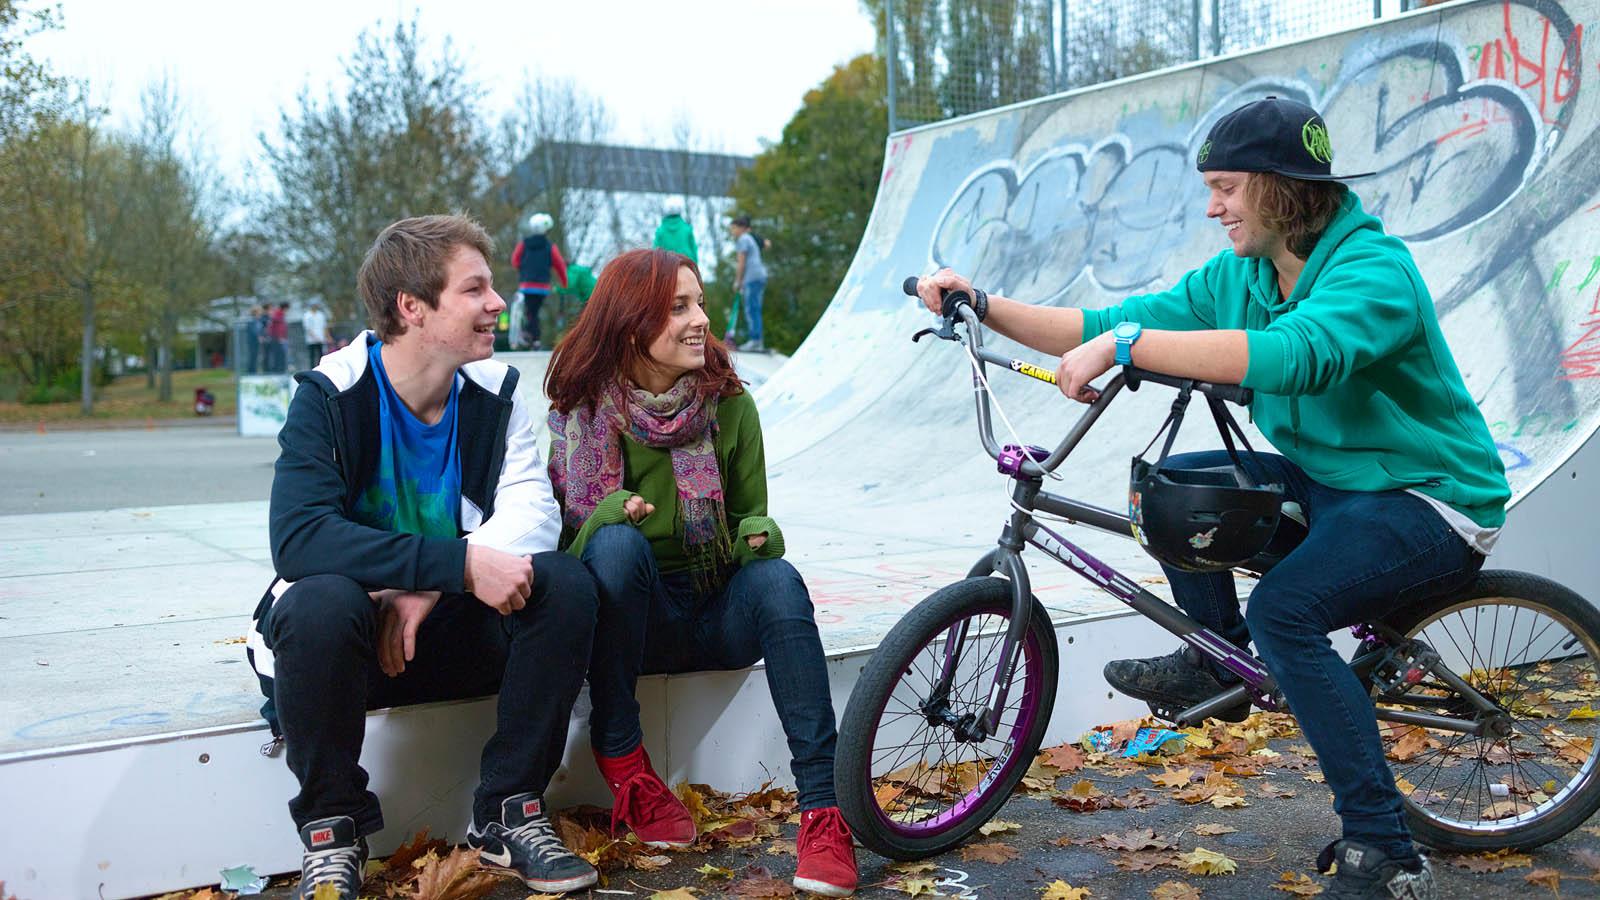 Jugend2 - Stadt Waiblingen: Junge Stadt in alten Mauern